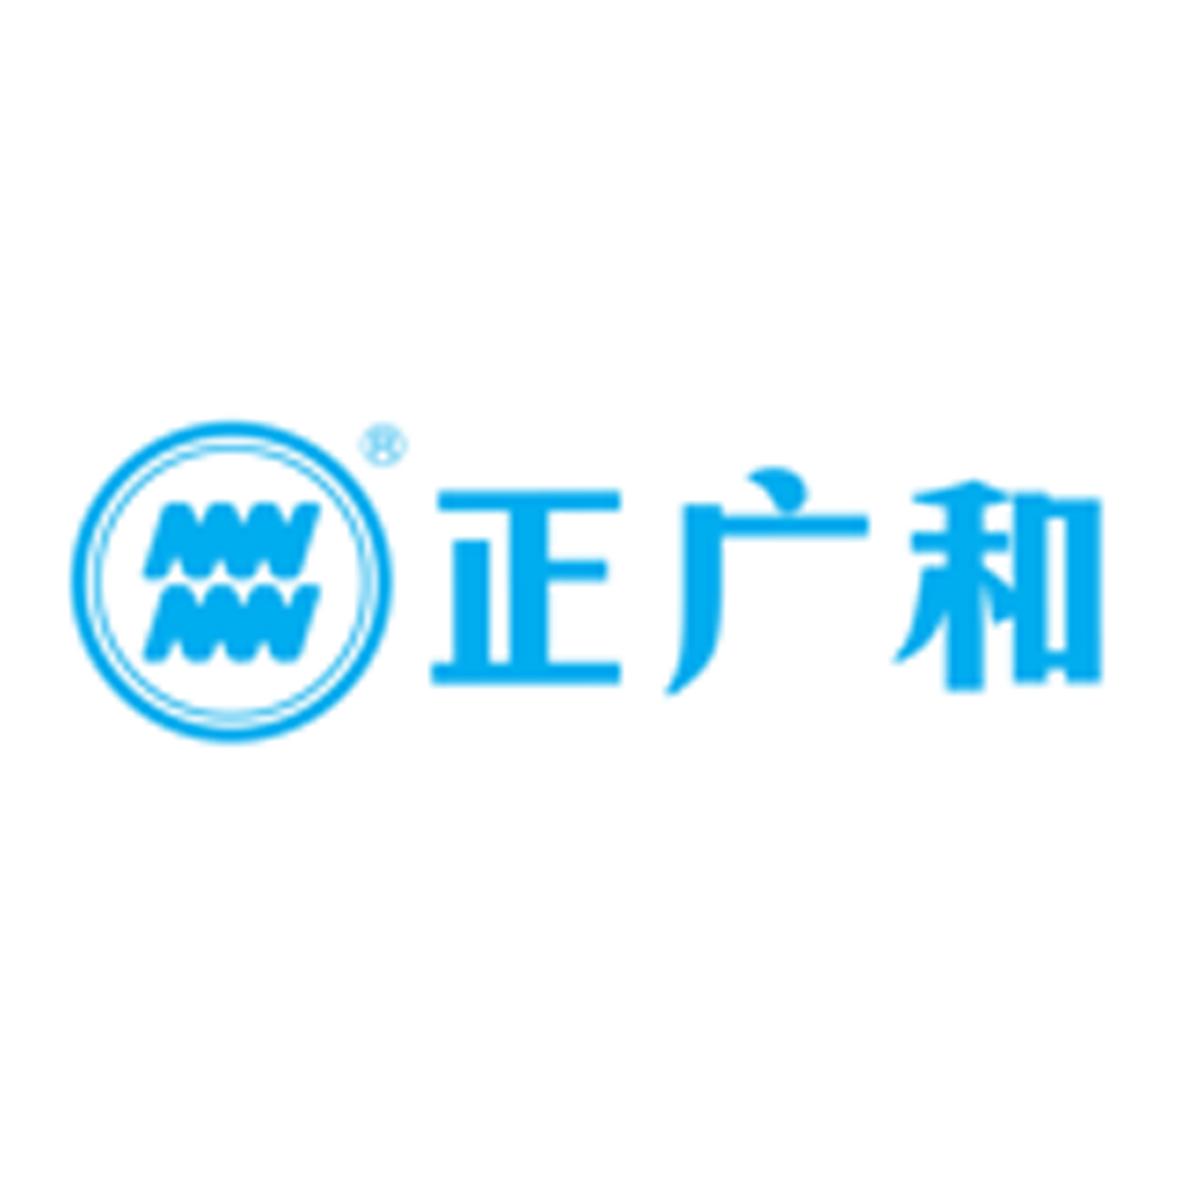 "<div style=""text-align:center;""> 正广和 </div>"